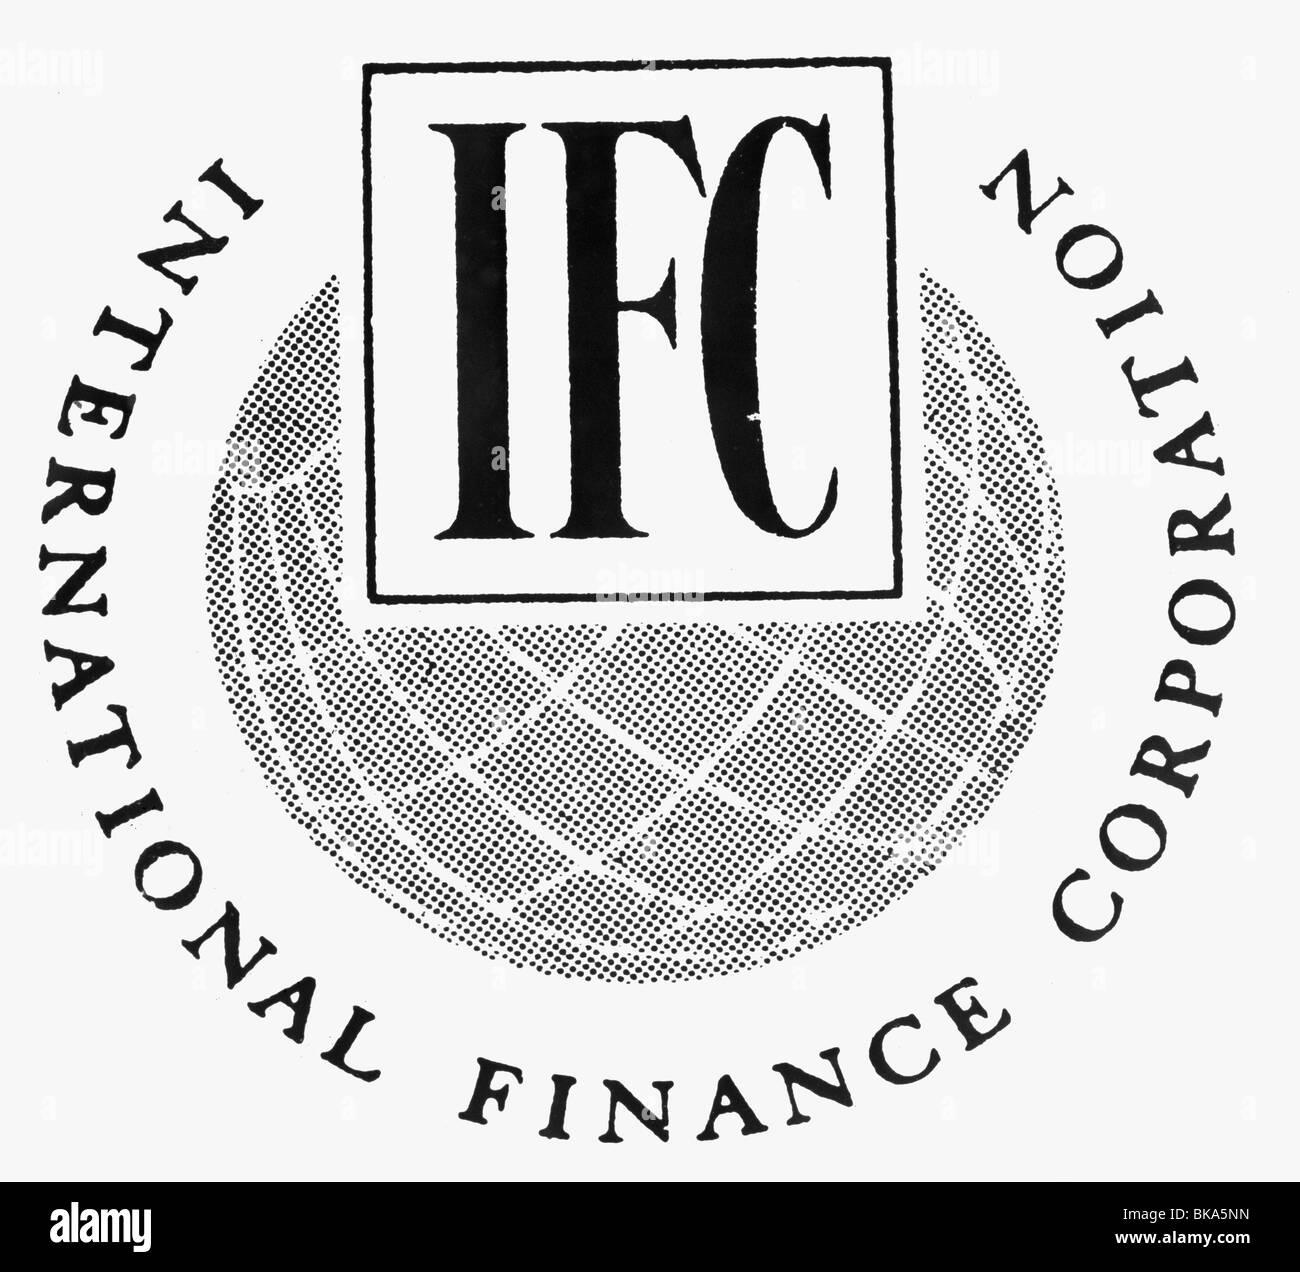 politics, international organizations, International Finance Corporation (IFC), founded in 1956, Additional-Rights - Stock Image